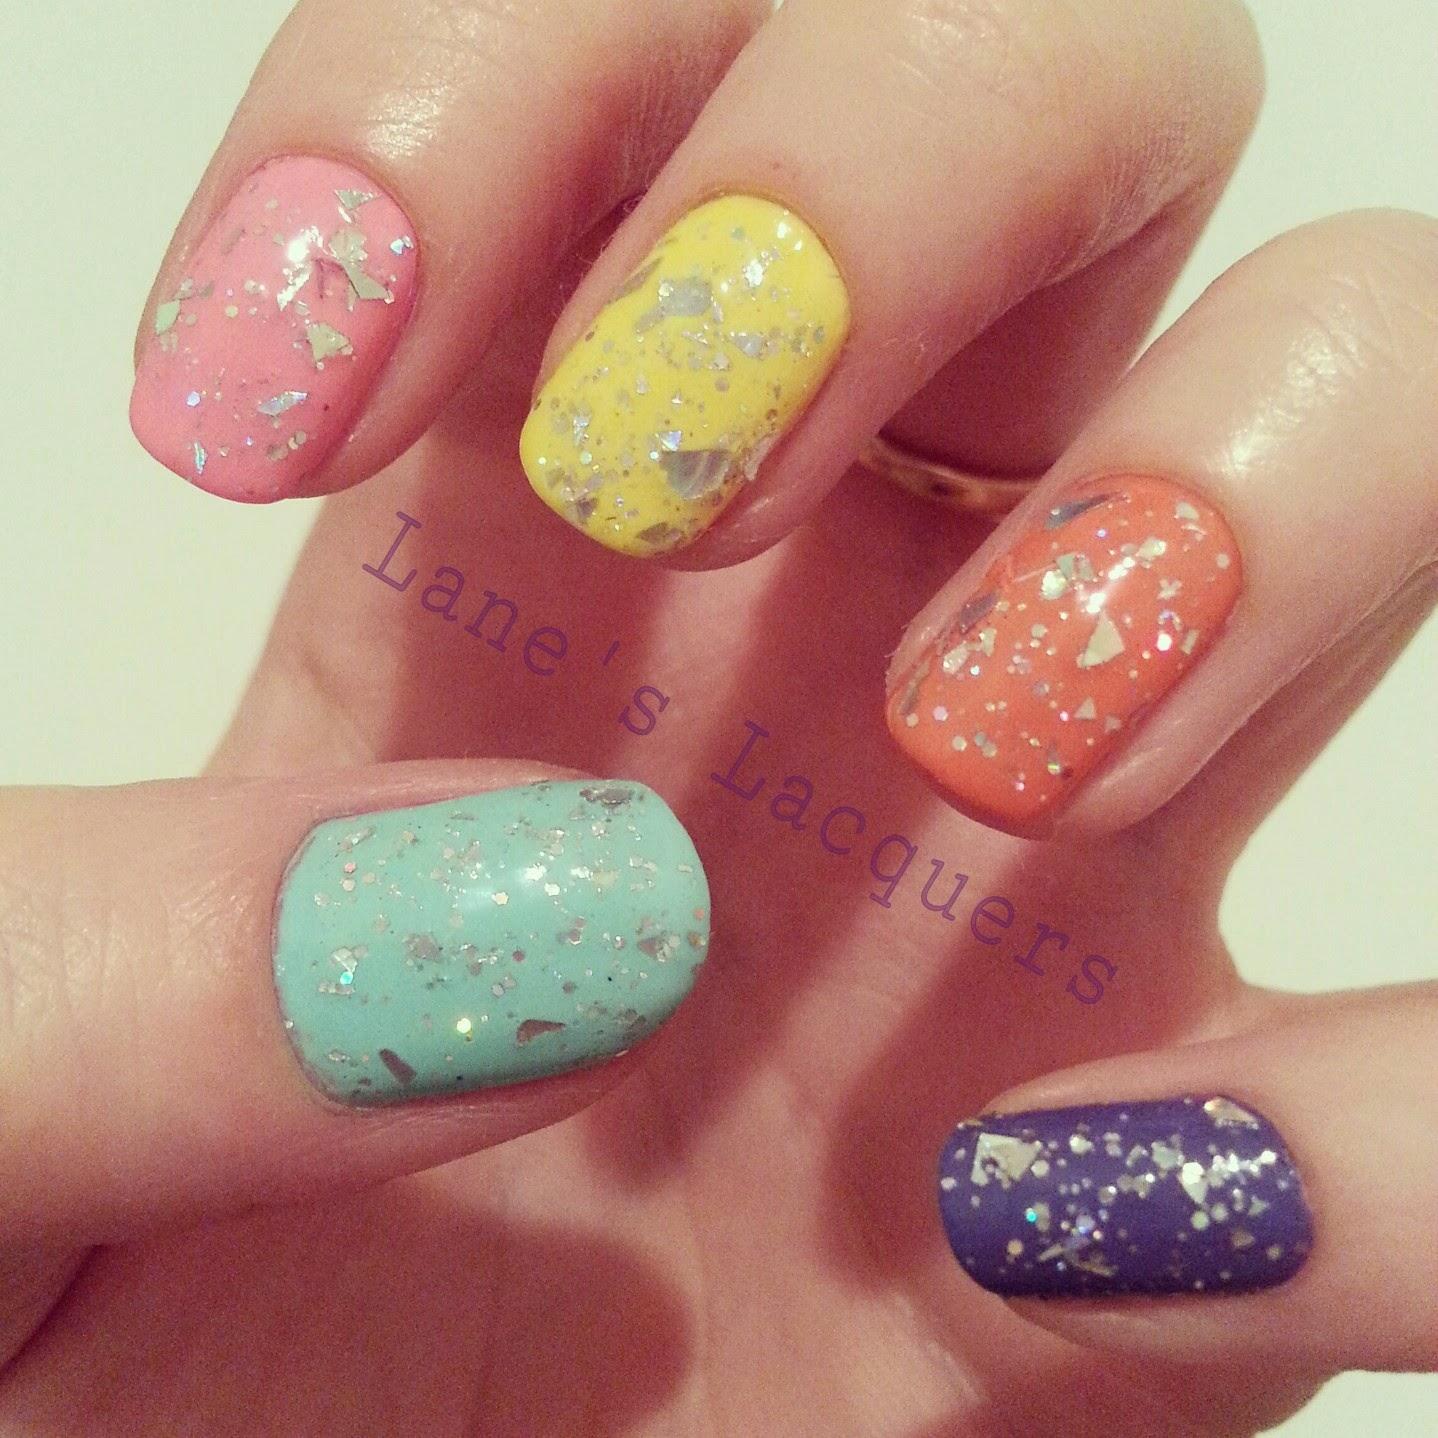 GOT-polish-challenge-nails-inc-pastels-nail-art